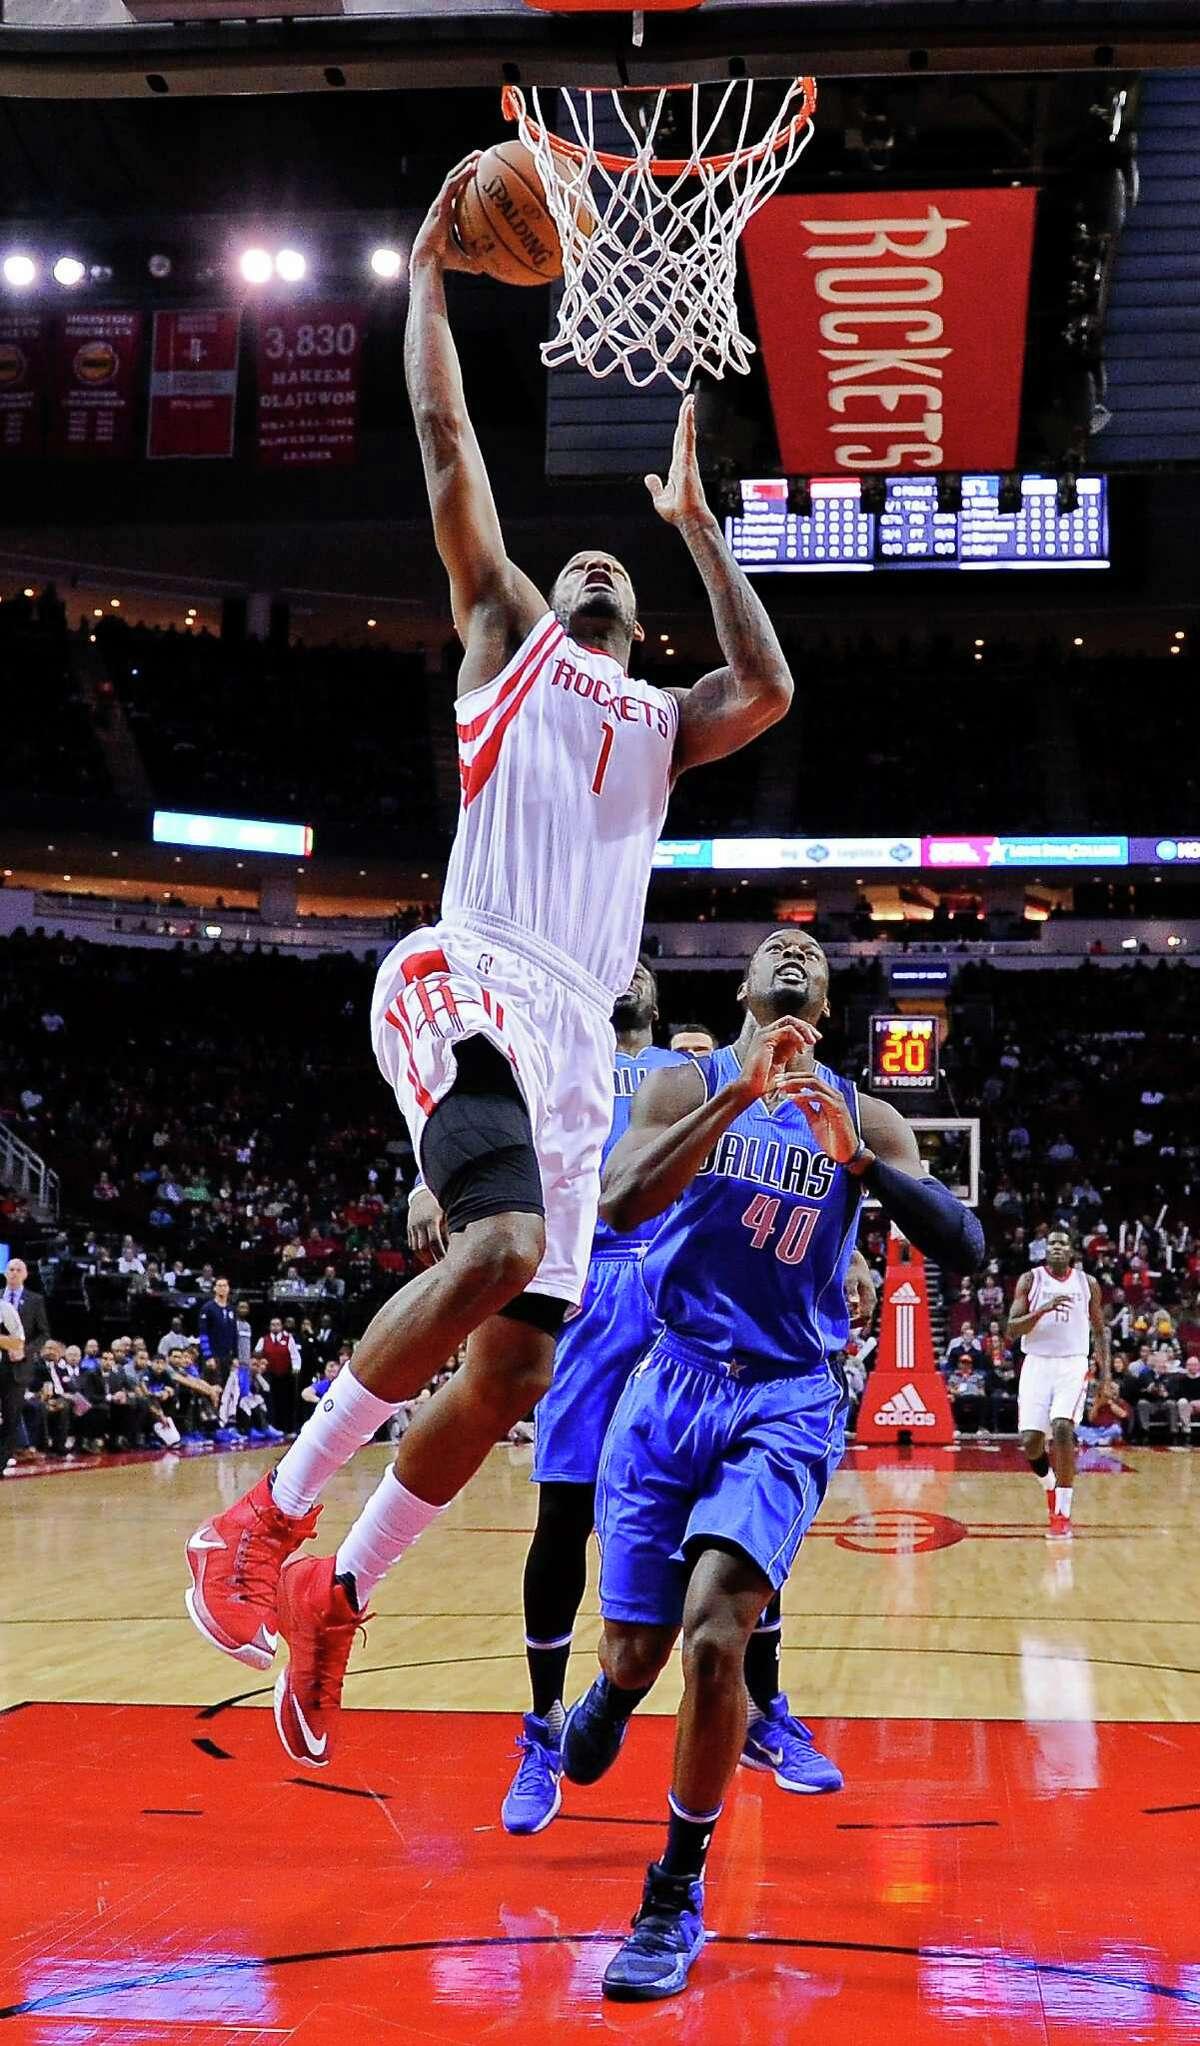 Houston Rockets forward Trevor Ariza (1) shoots past Dallas Mavericks forward Harrison Barnes (40) during the first half of an NBA basketball game, Saturday, Dec. 10, 2016, in Houston. (AP Photo/Eric Christian Smith)